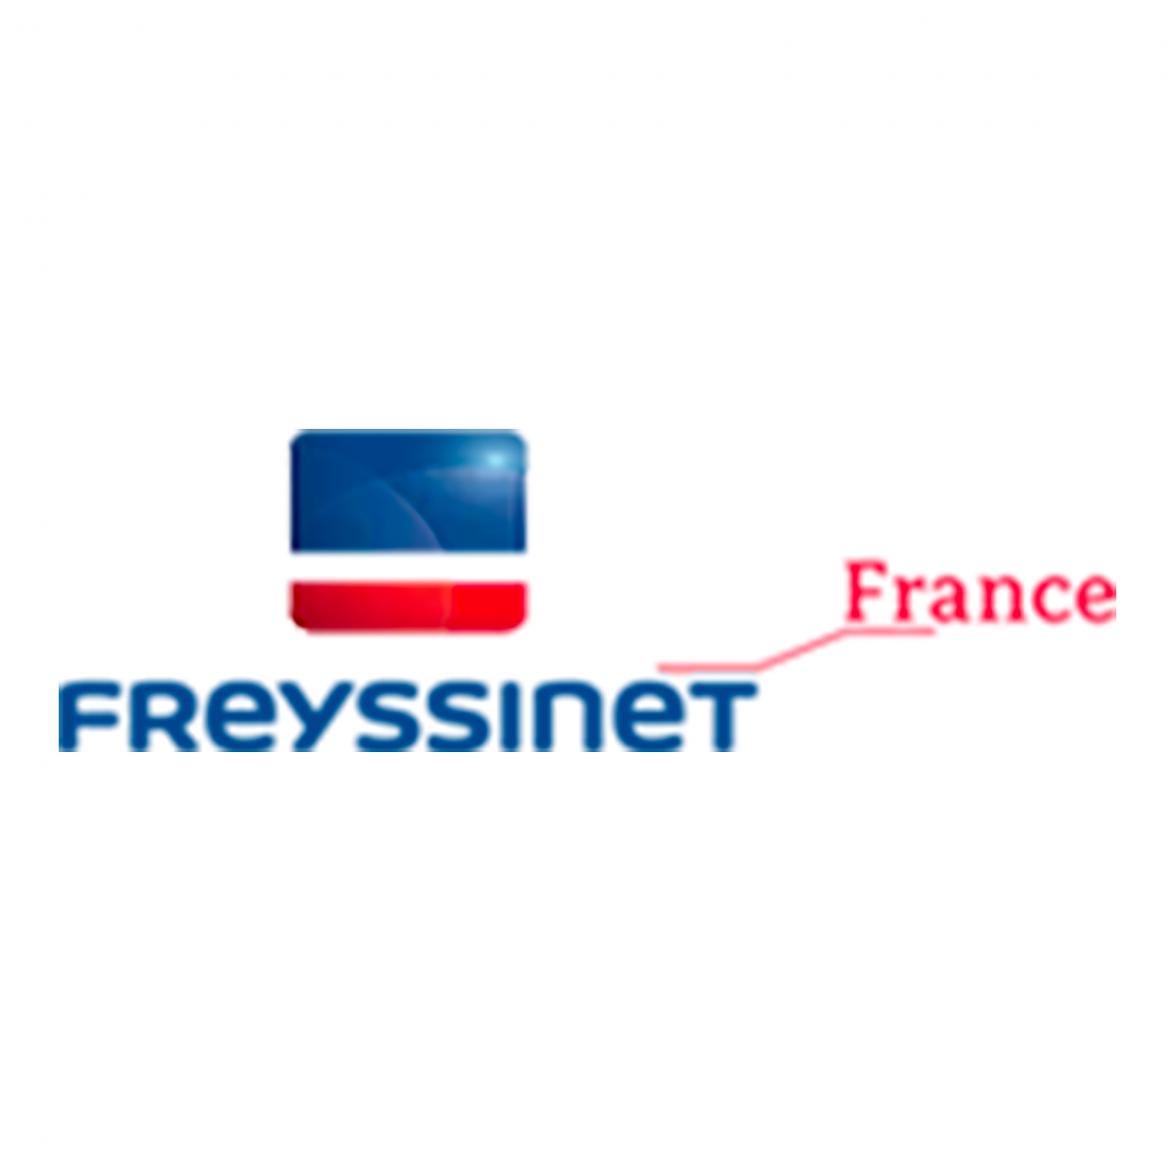 Angèle Von kiss - Mes clients - FREYSSINET France